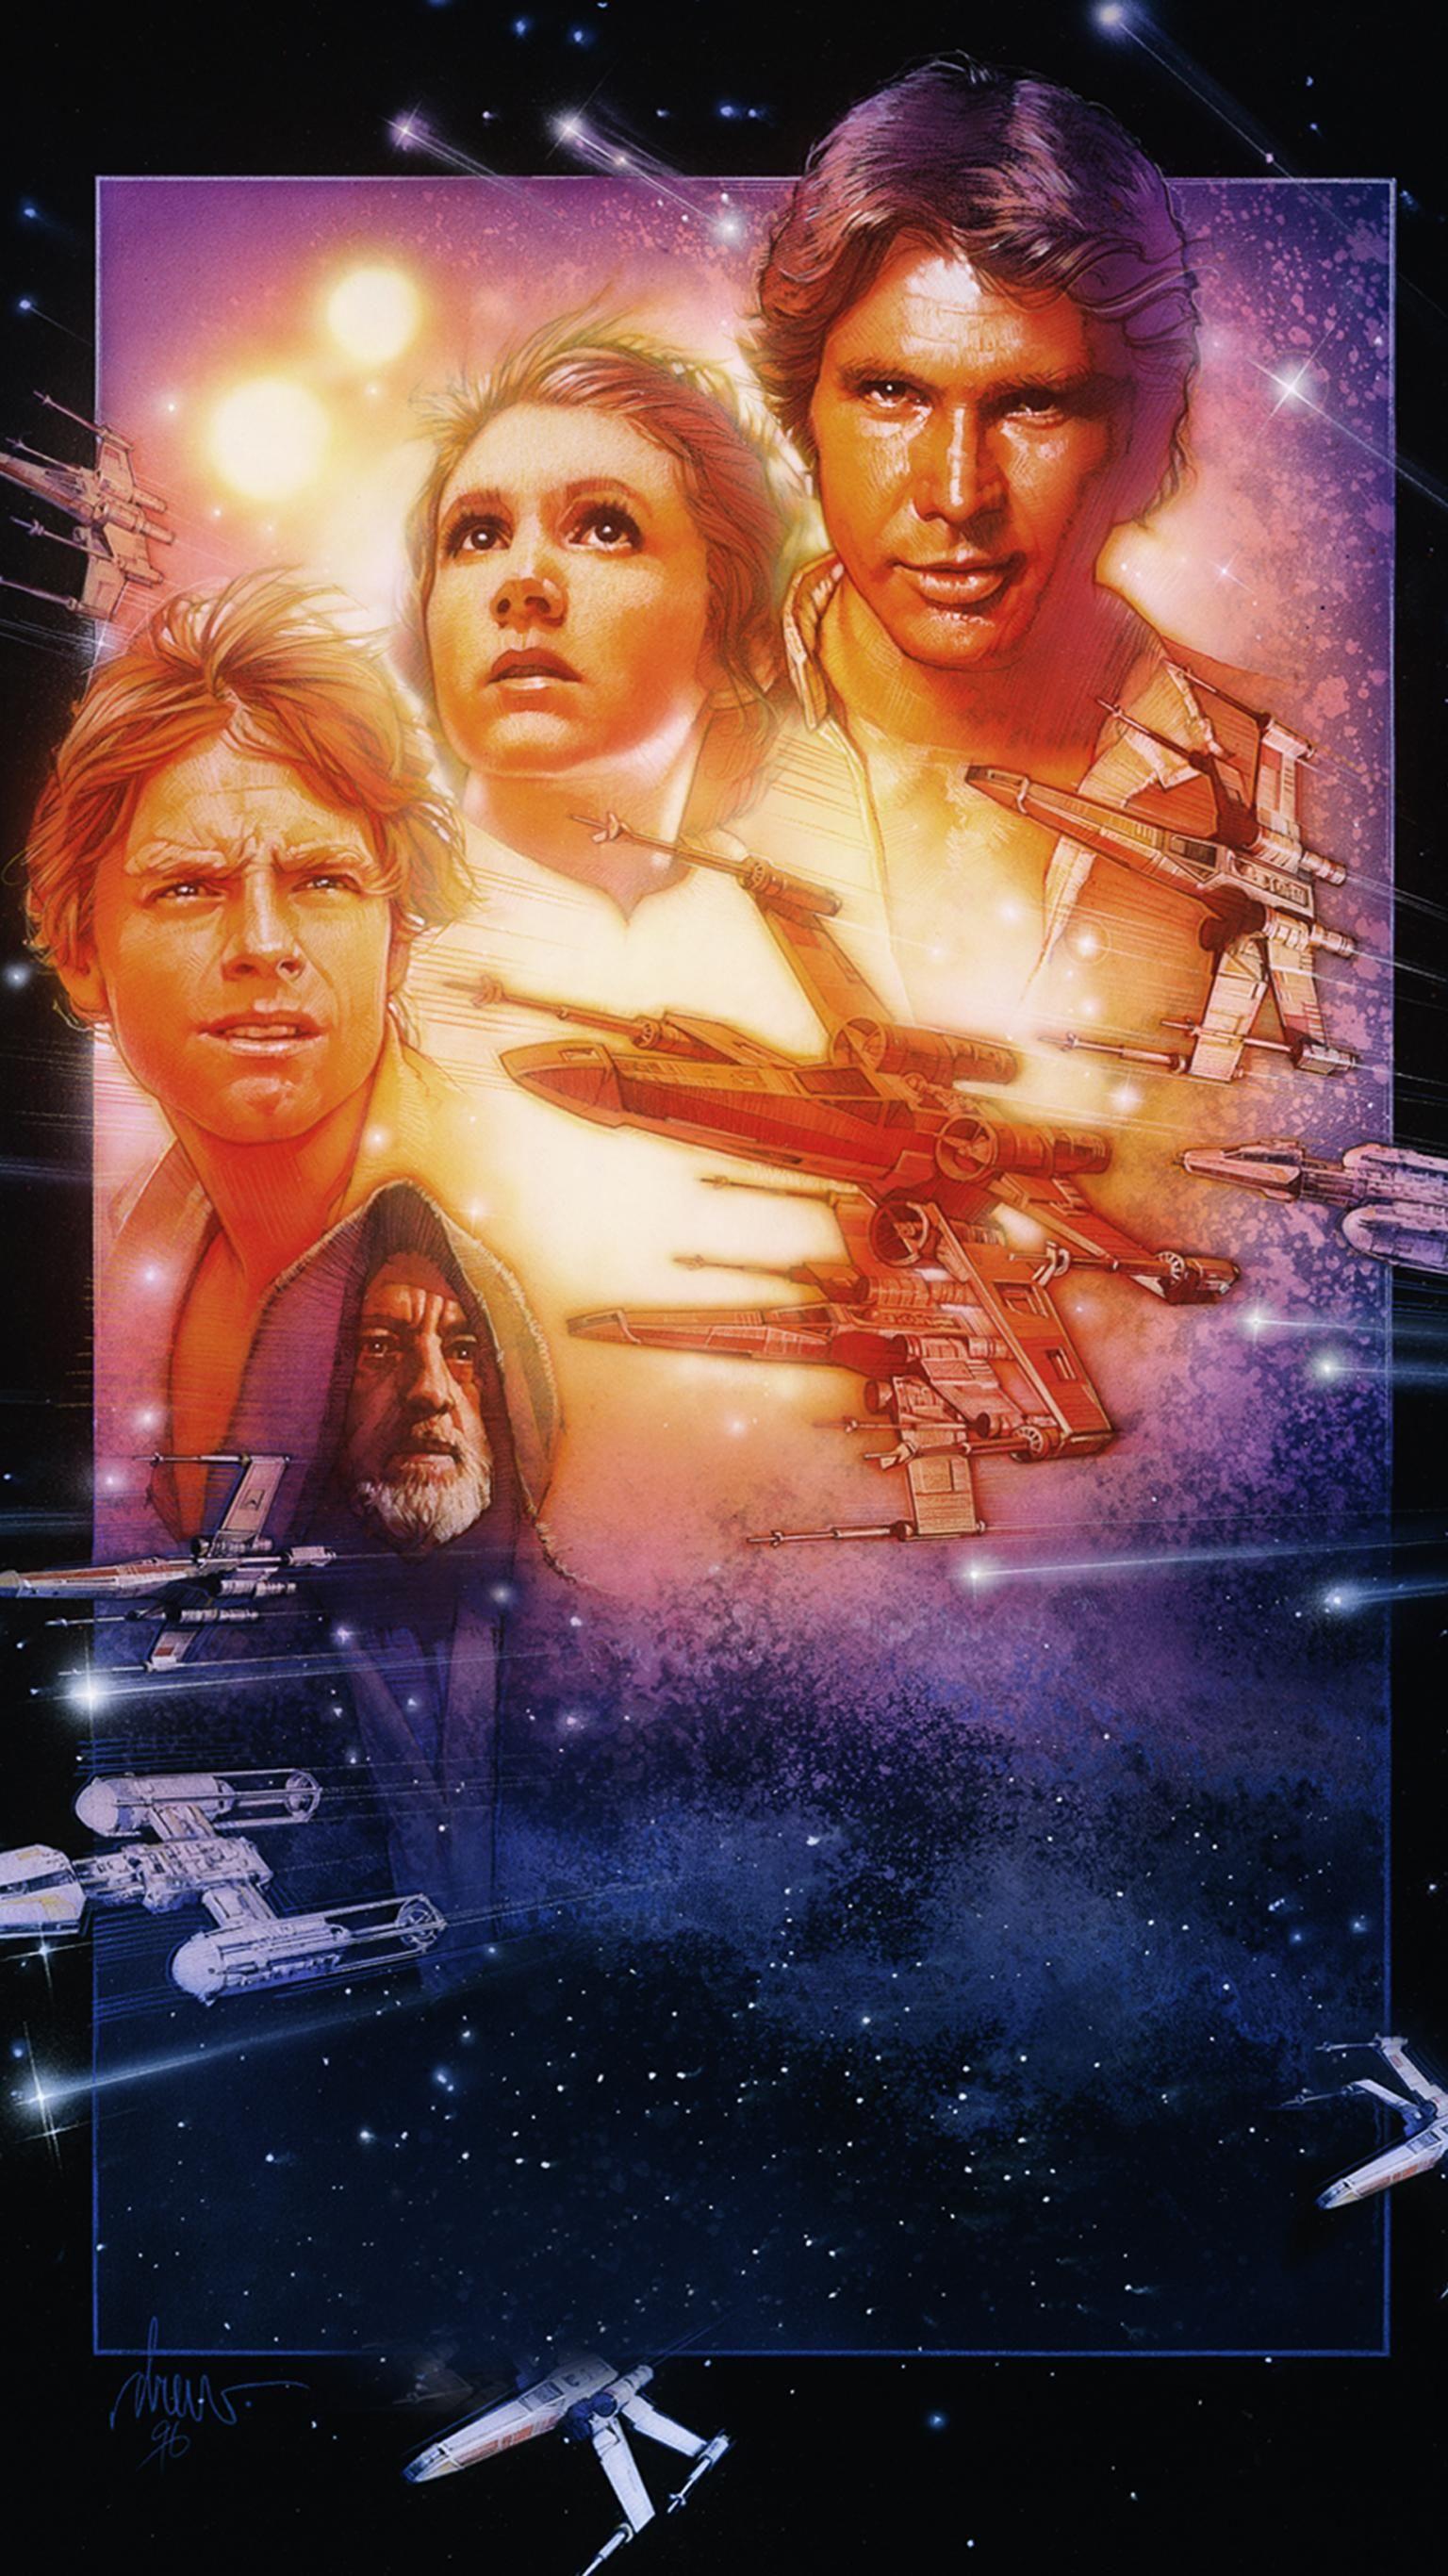 Star Wars (1977) Phone Wallpaper | Moviemania